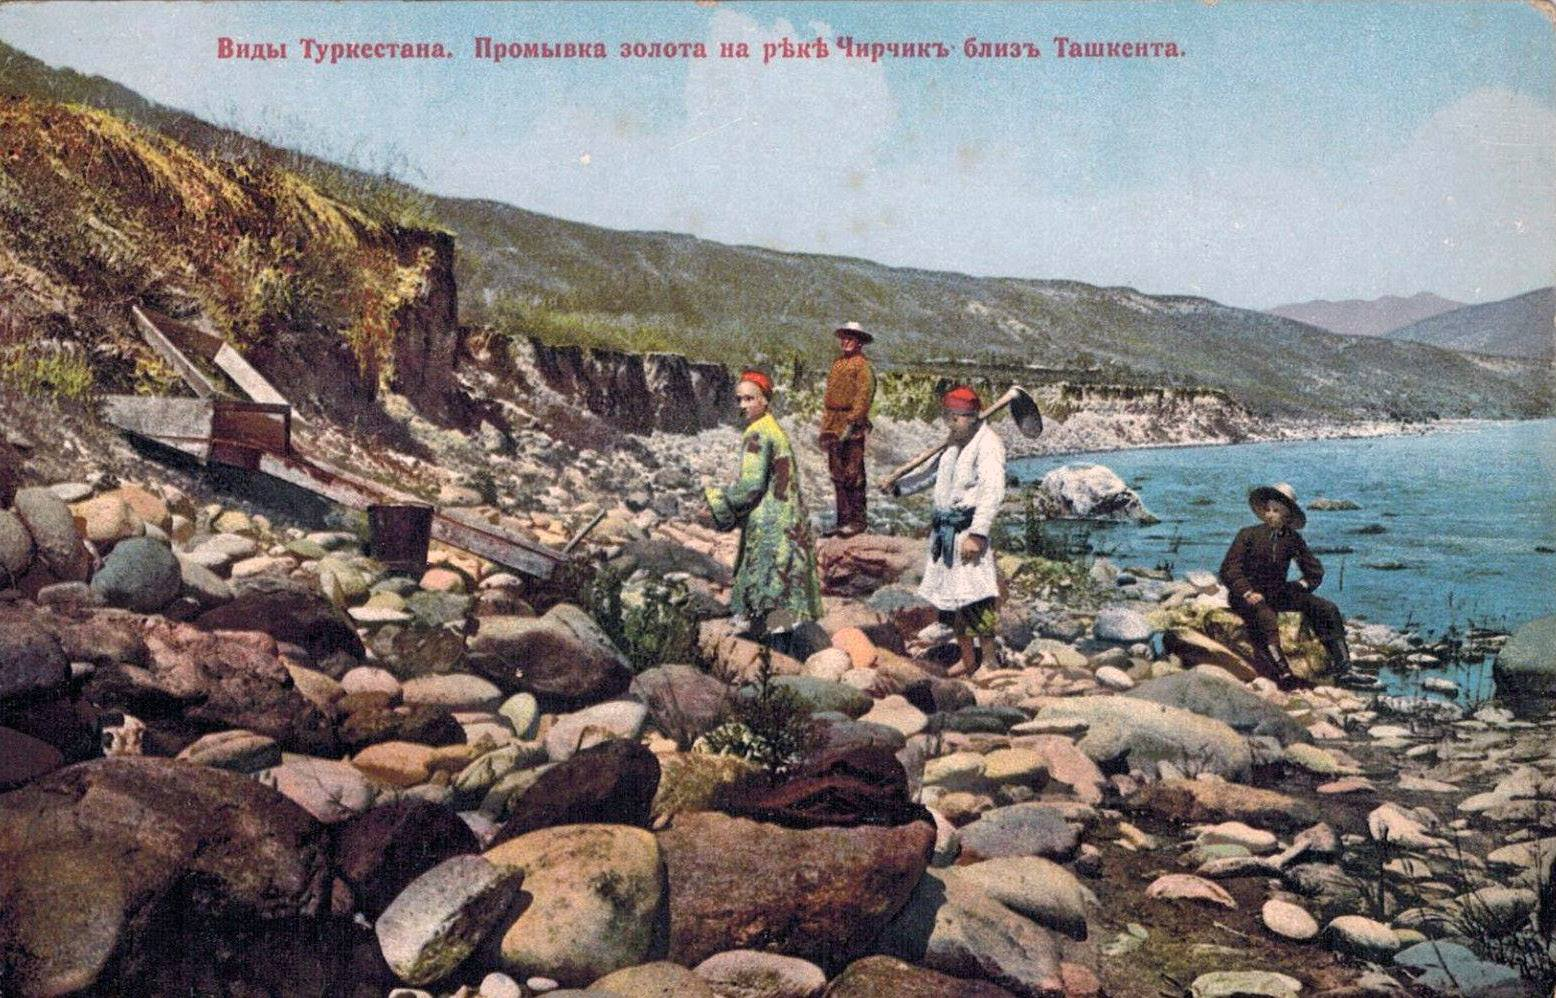 Окрестности Ташкента. Промывка золота на реке Чирчик